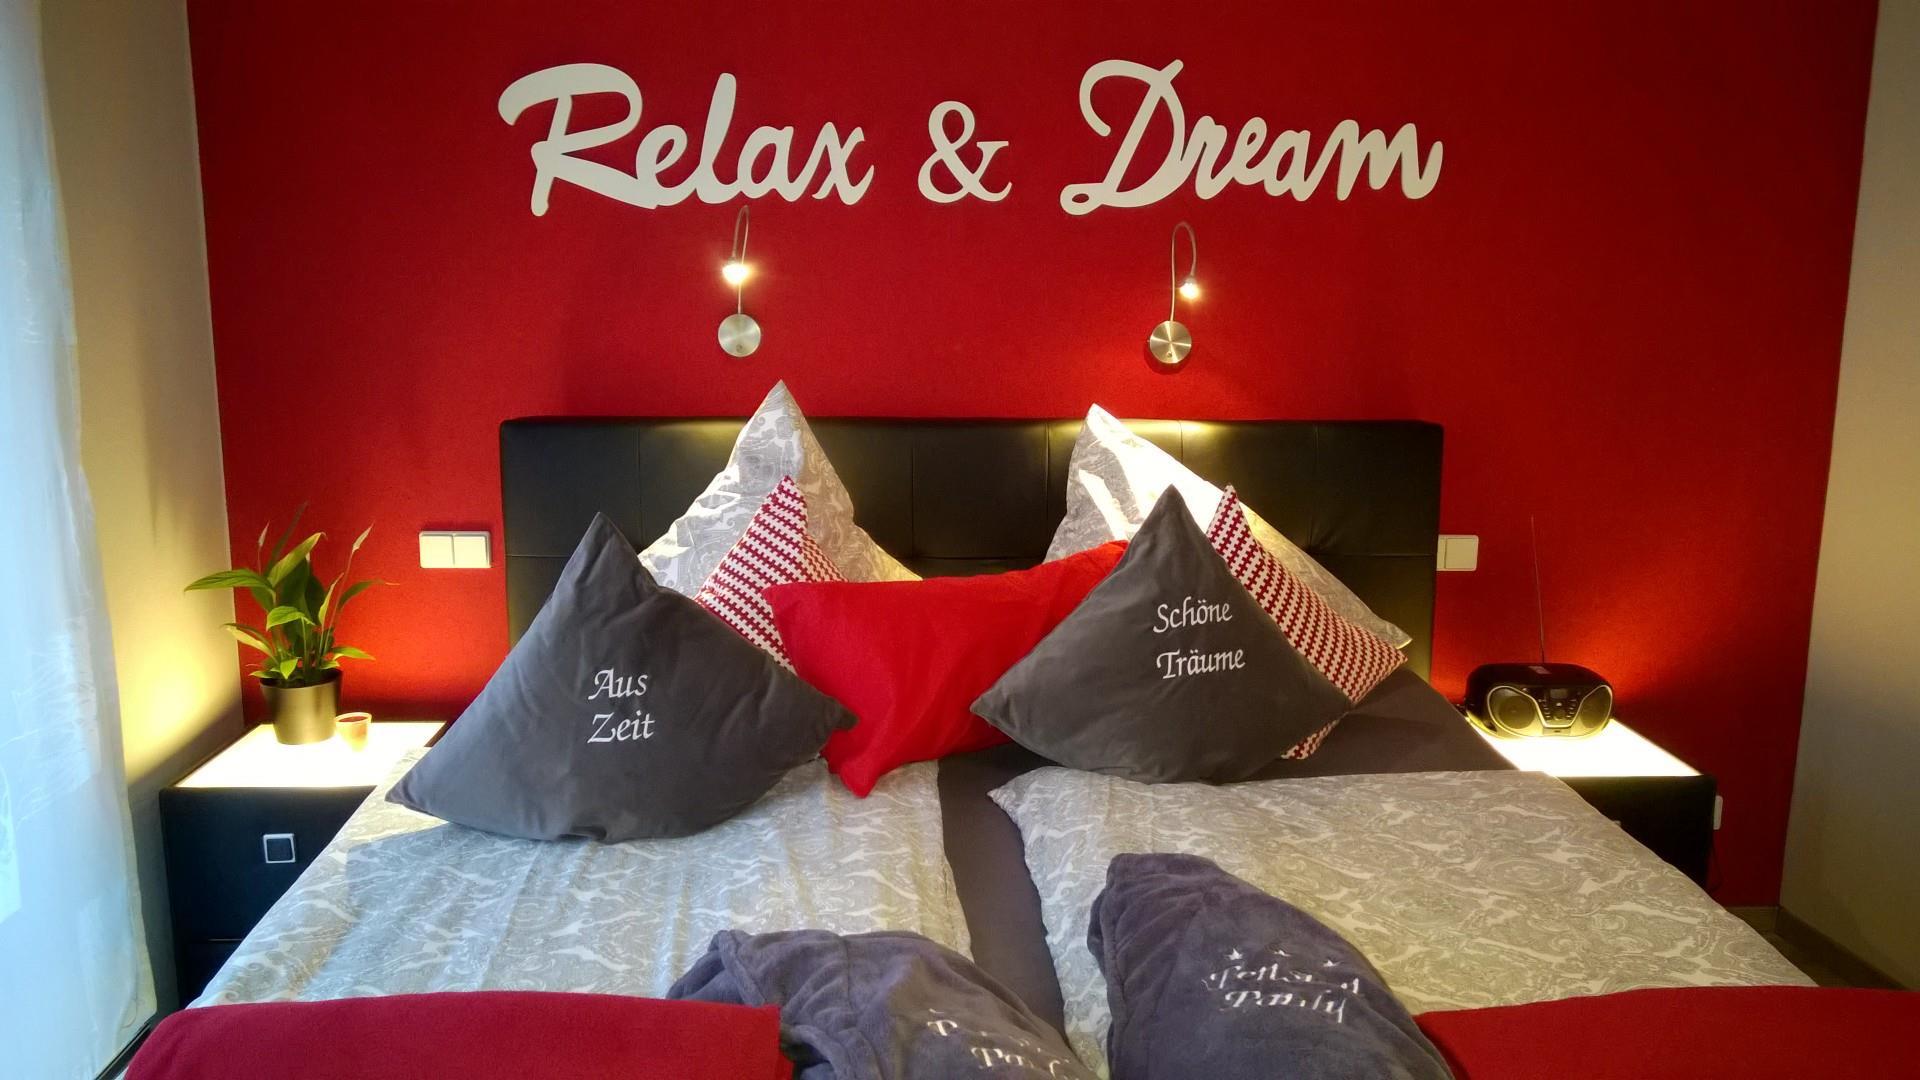 Relax & Dream Boxspringbett